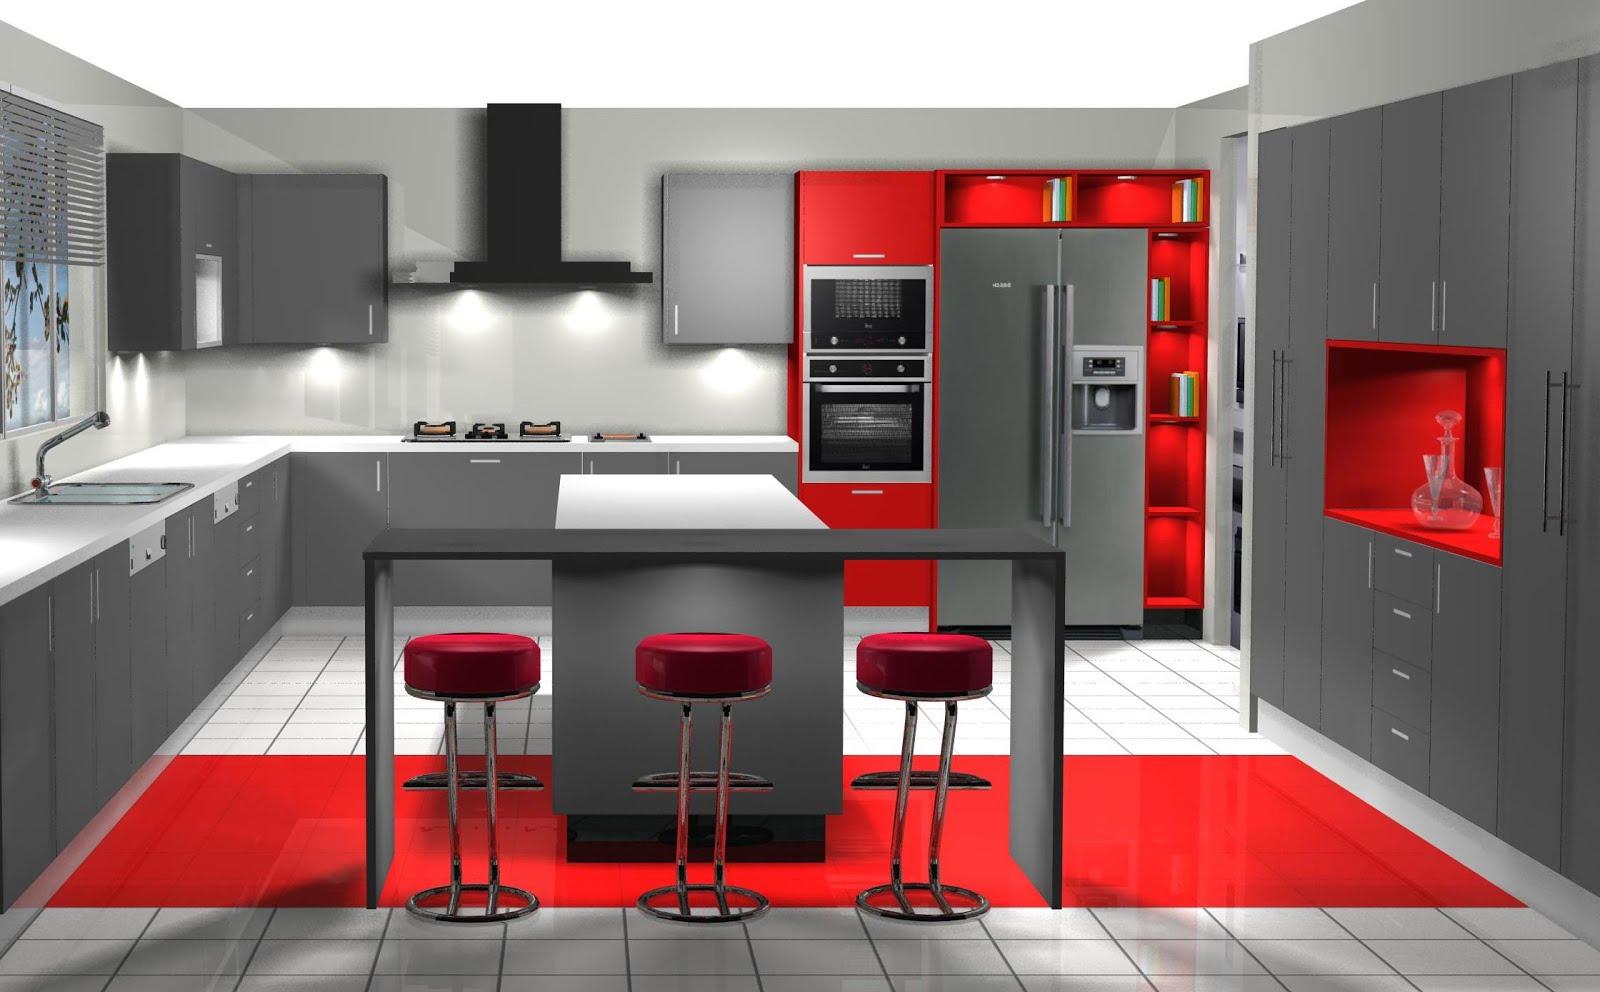 Dise o muebles de cocina dise o de cocina comedor en madera - Muebles de cocina en leganes ...